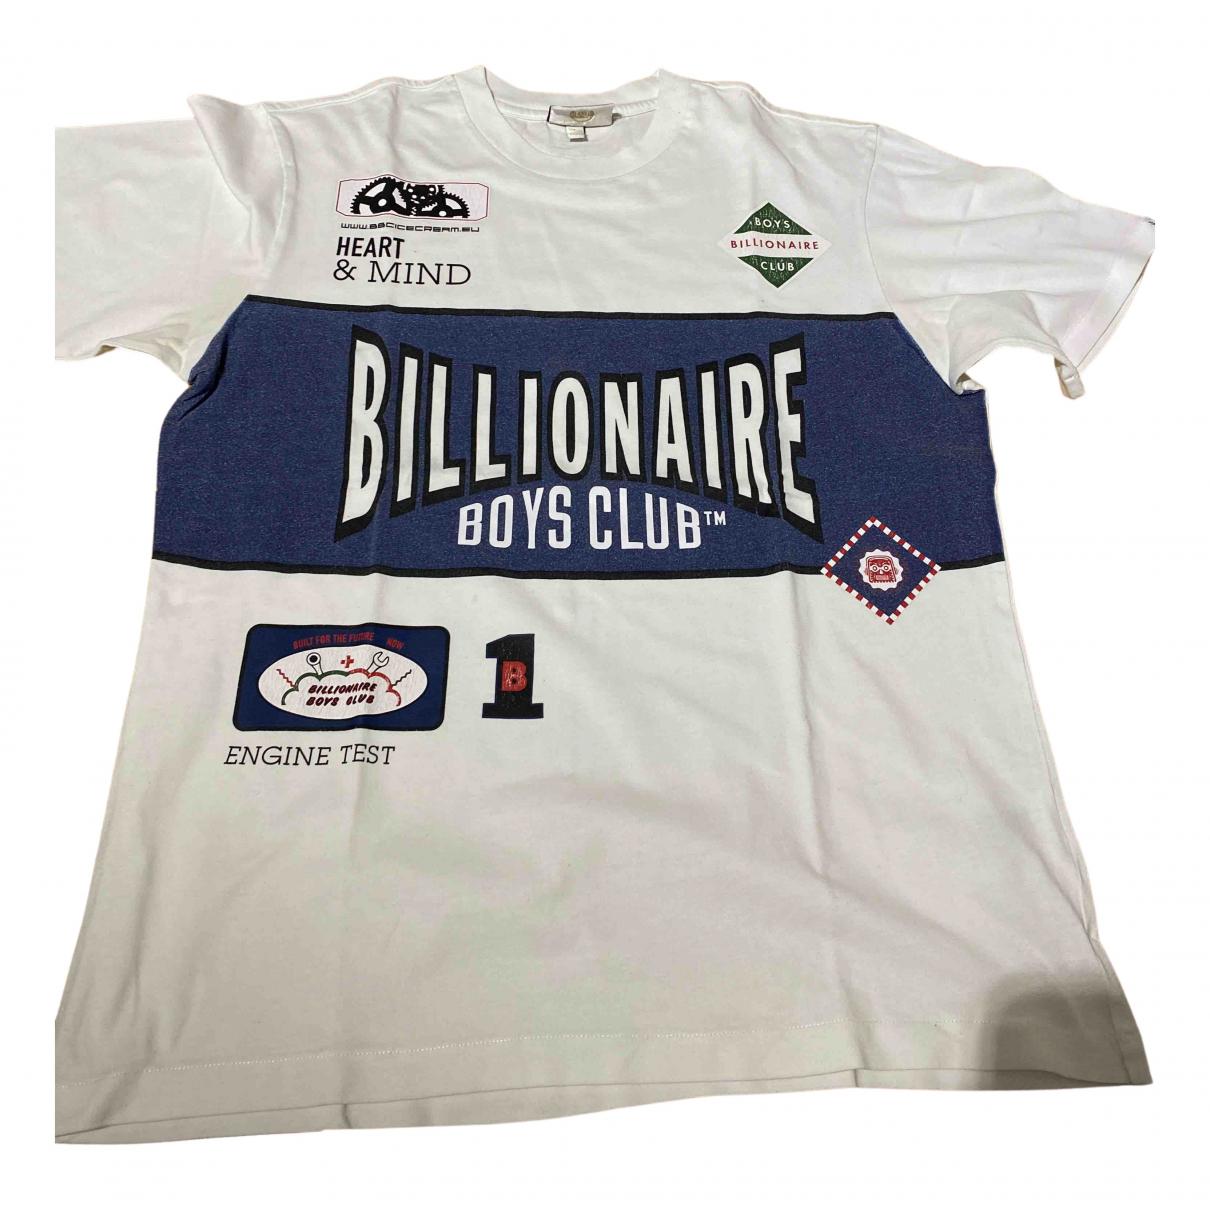 Camiseta Billionaire Boys Club